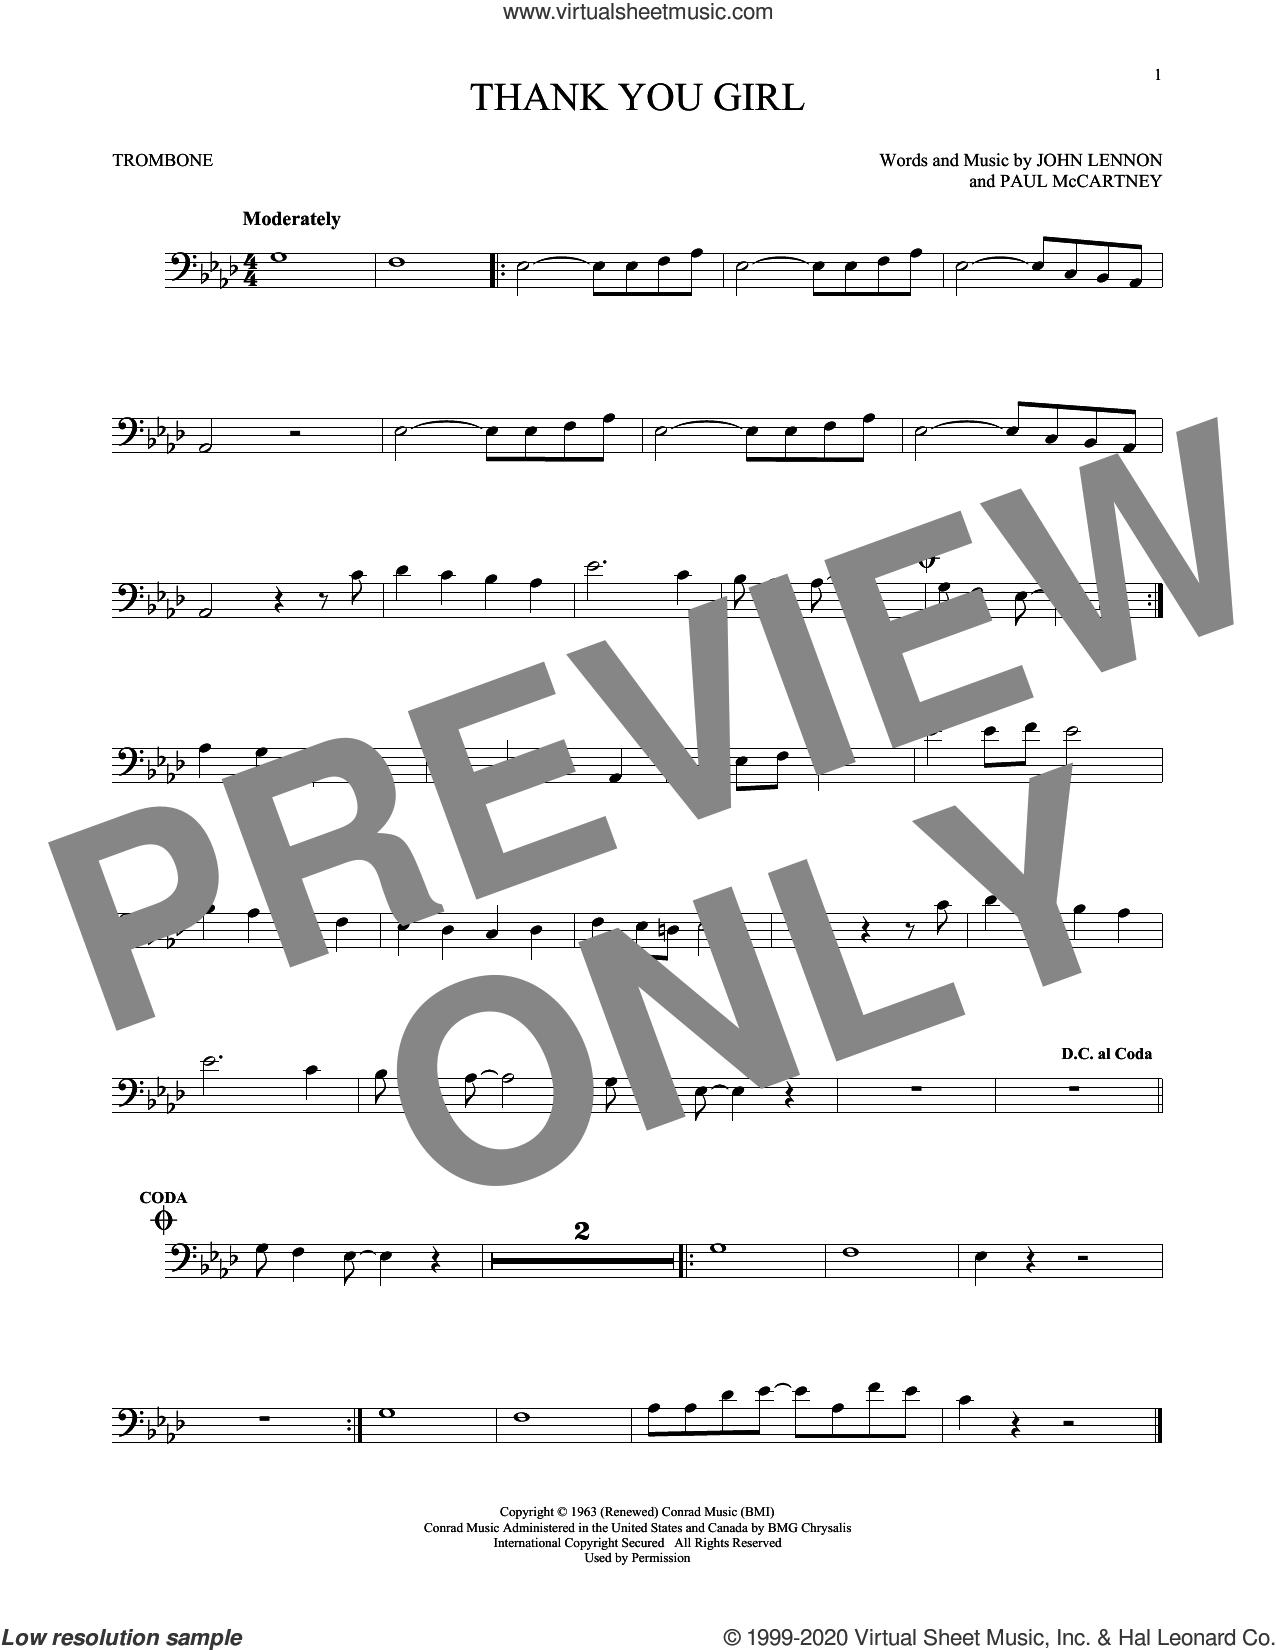 Thank You Girl sheet music for trombone solo by The Beatles, John Lennon and Paul McCartney, intermediate skill level